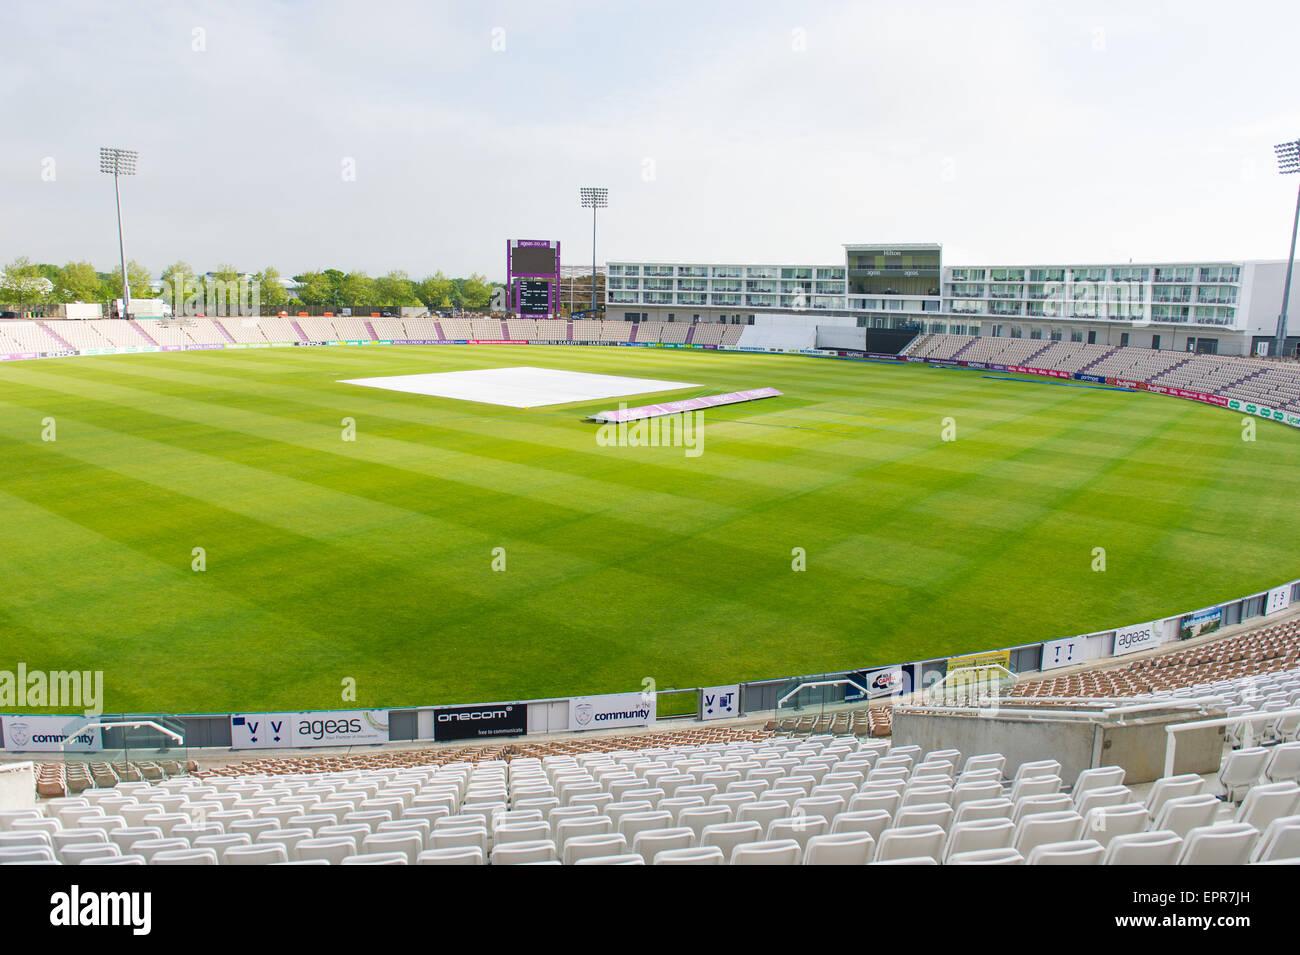 An Empty Ageas Bowl Cricket Ground The Ageas Bowl Formerly